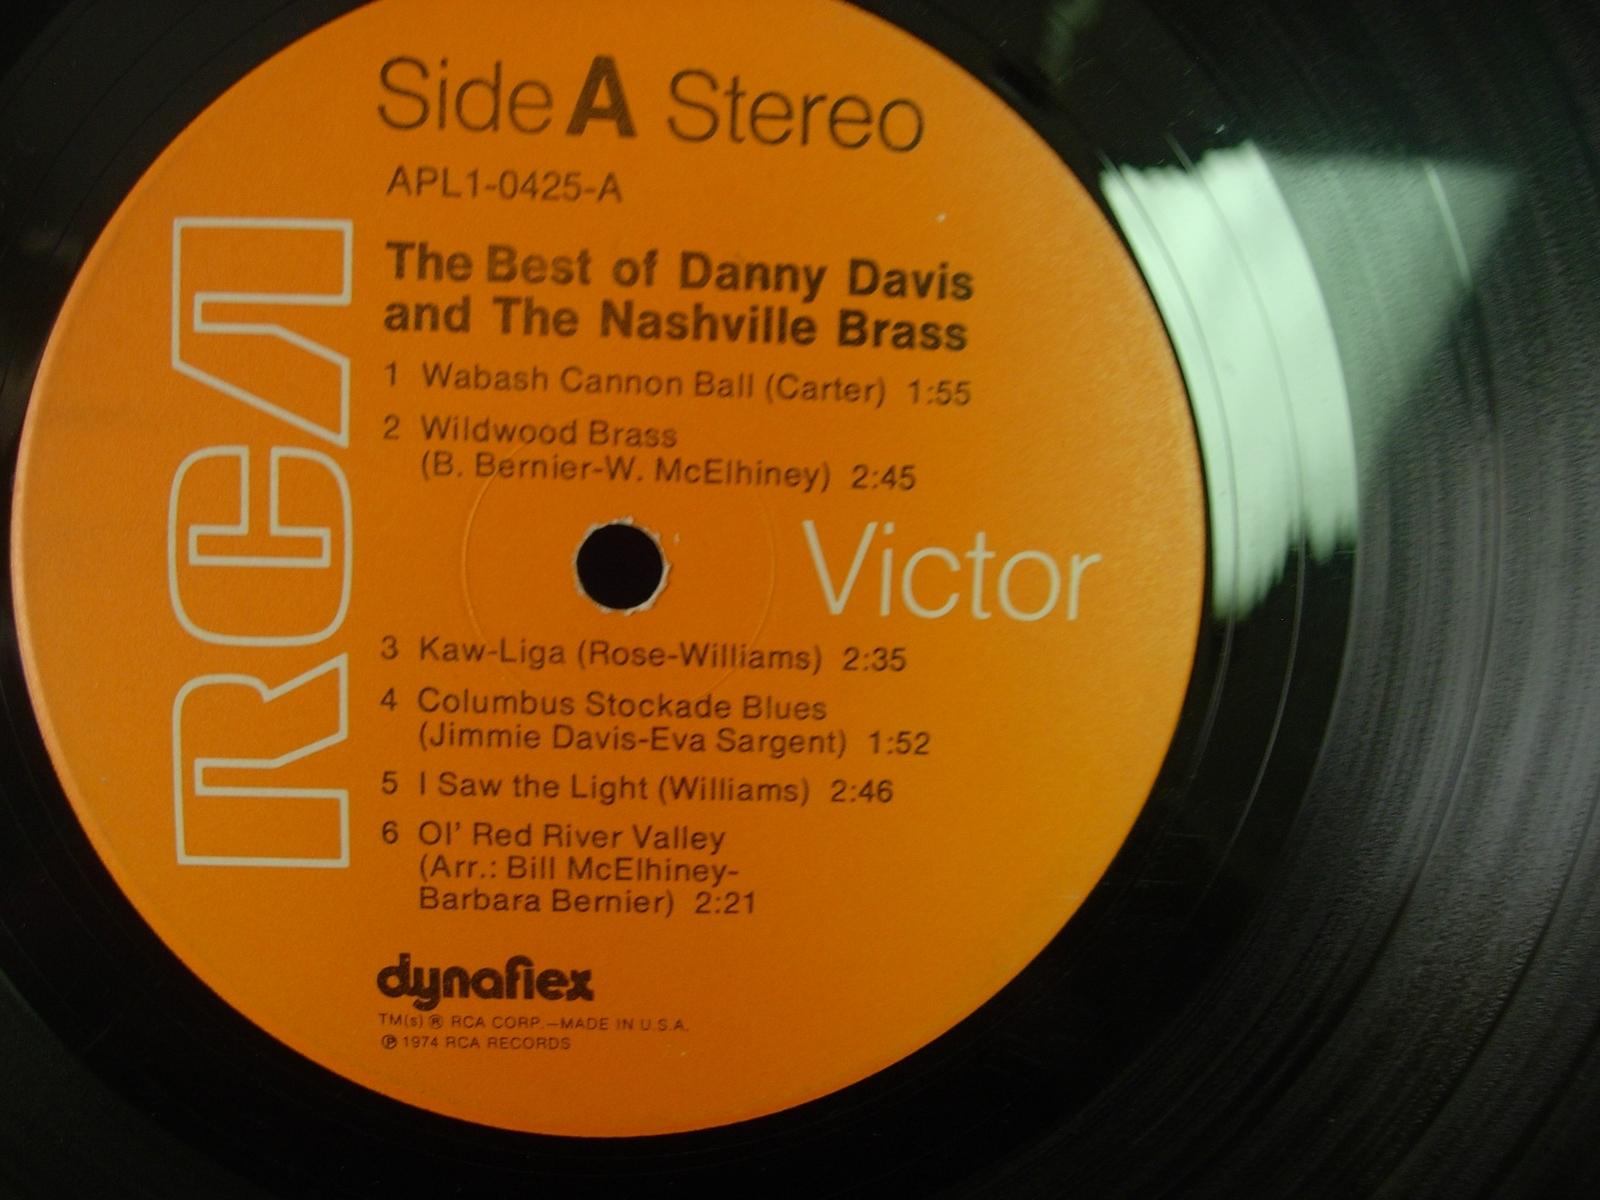 The Best of DANNY DAVIS & THE NASHVILLE BRASS - RCA APL1-0425